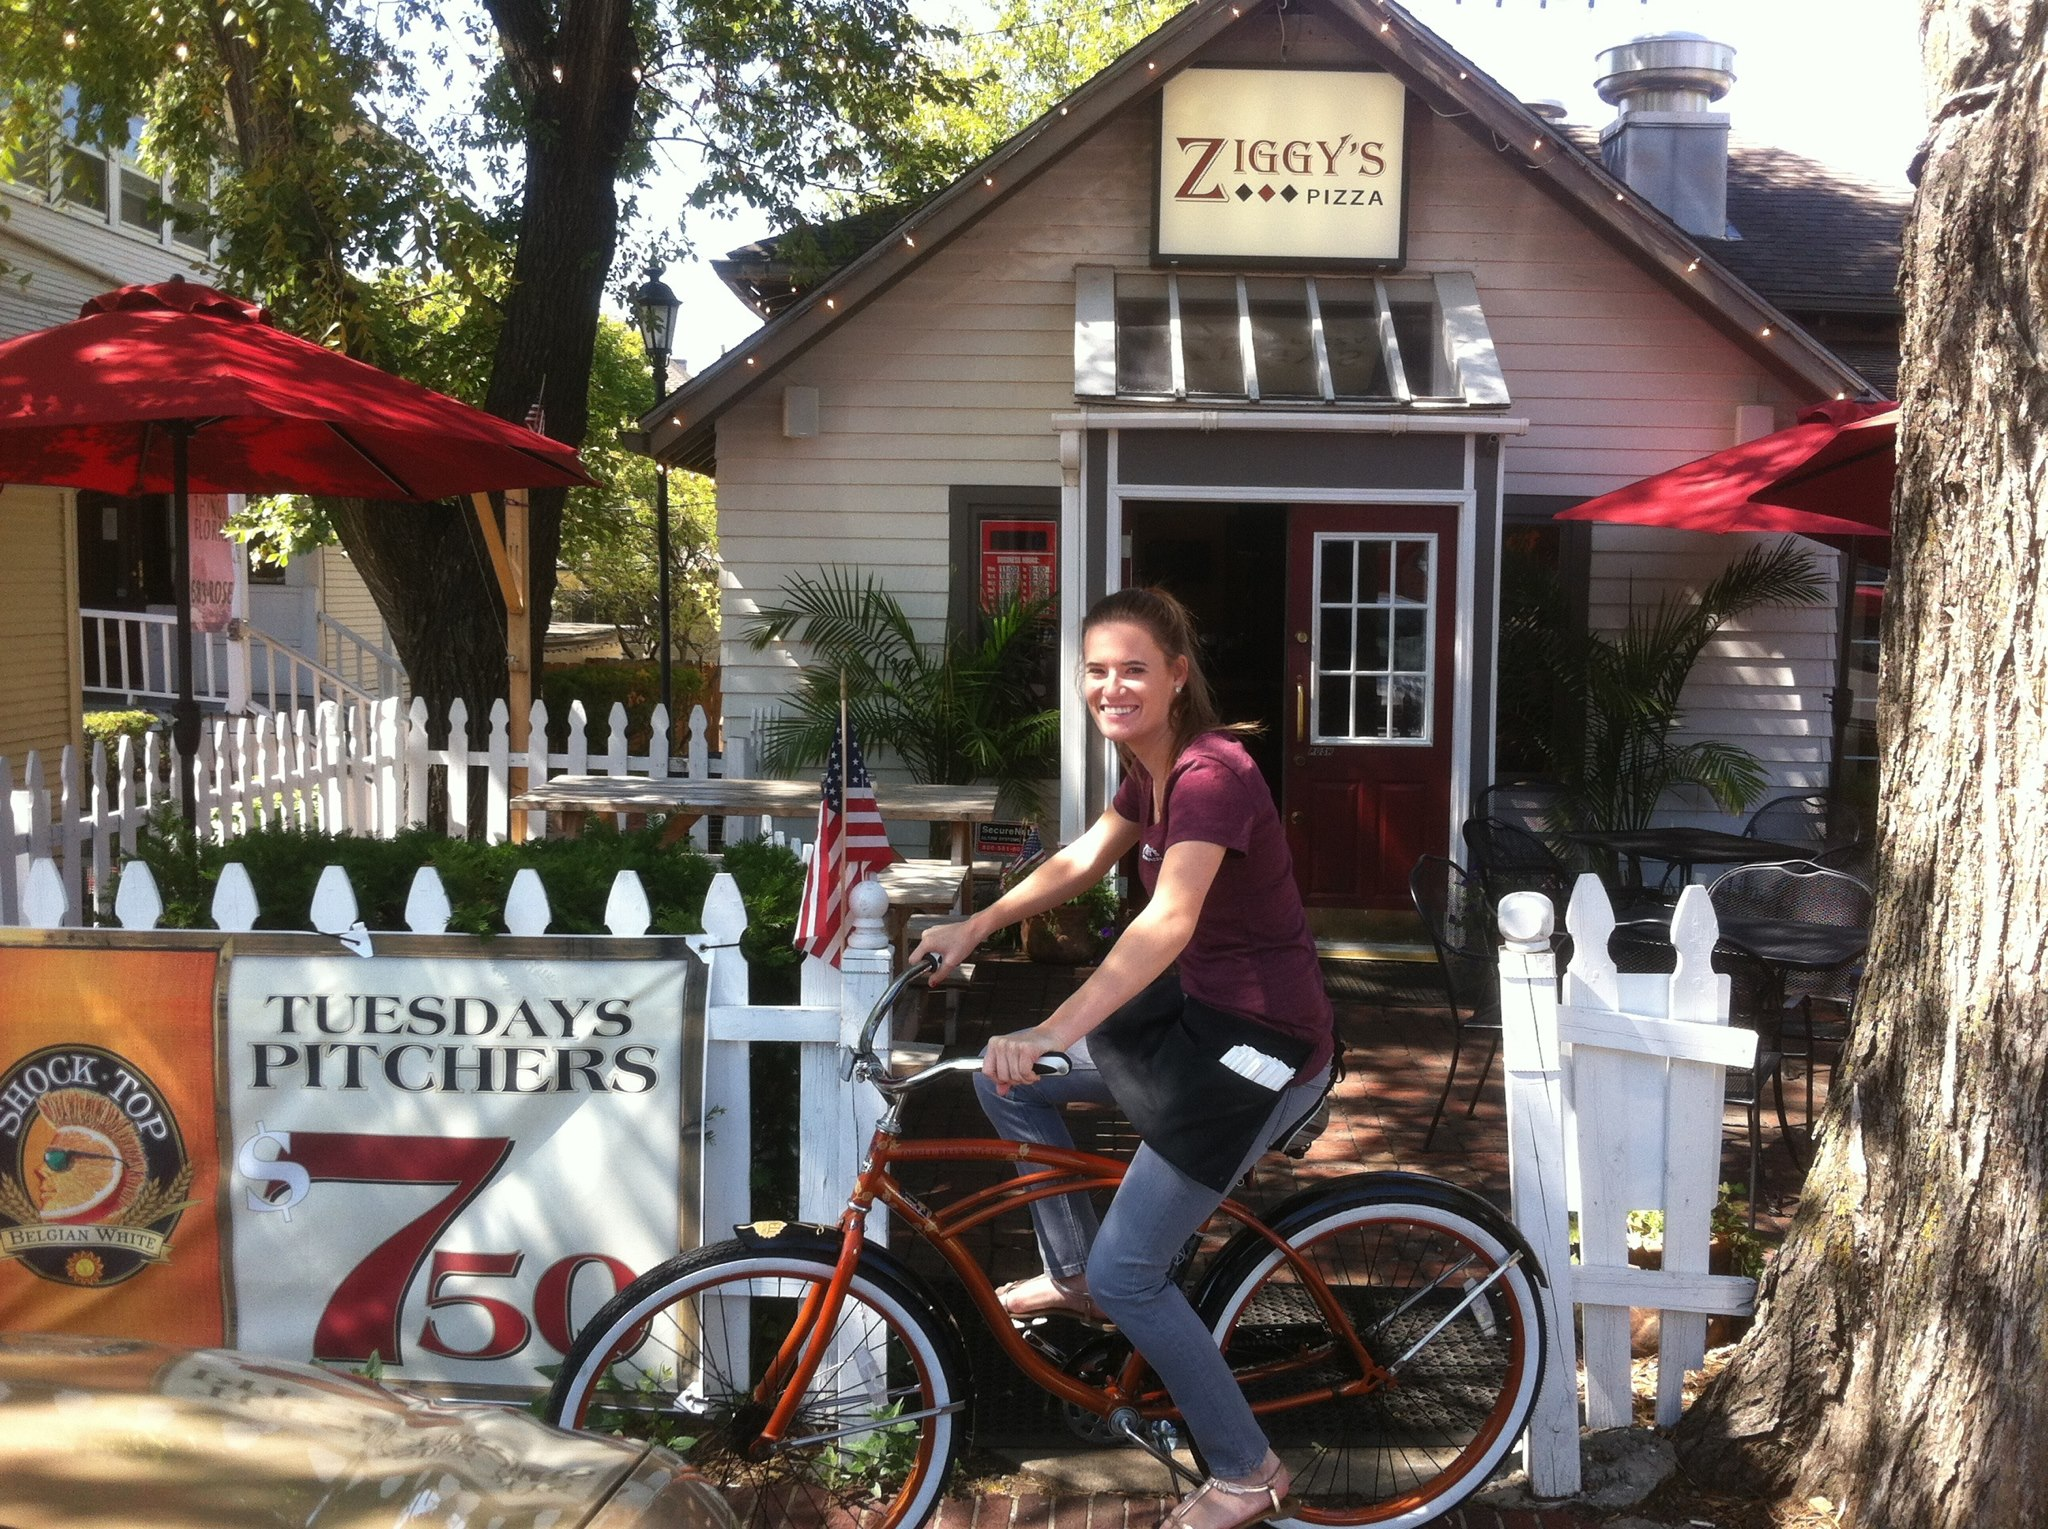 Bike-to-Ziggys.jpg